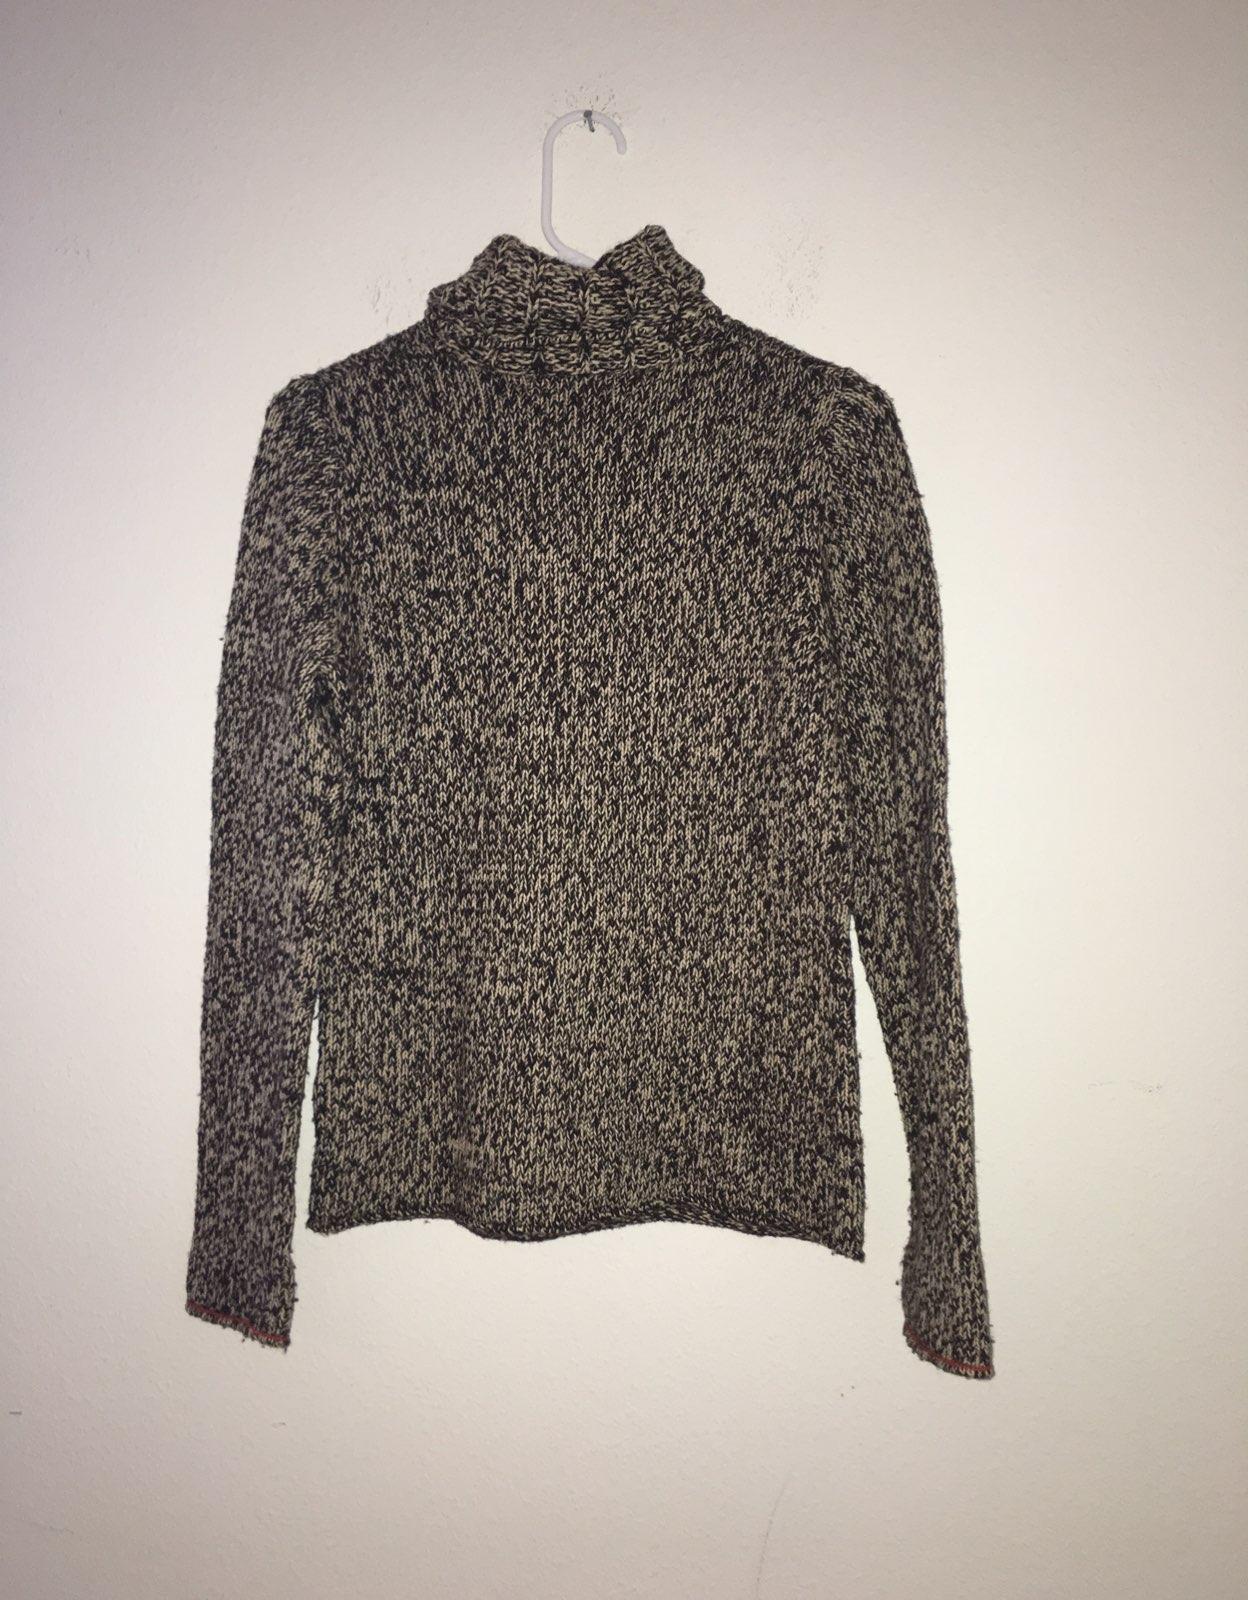 Gap Women's Brown Turtleneck Sweater M - Mercari: BUY & SELL ...